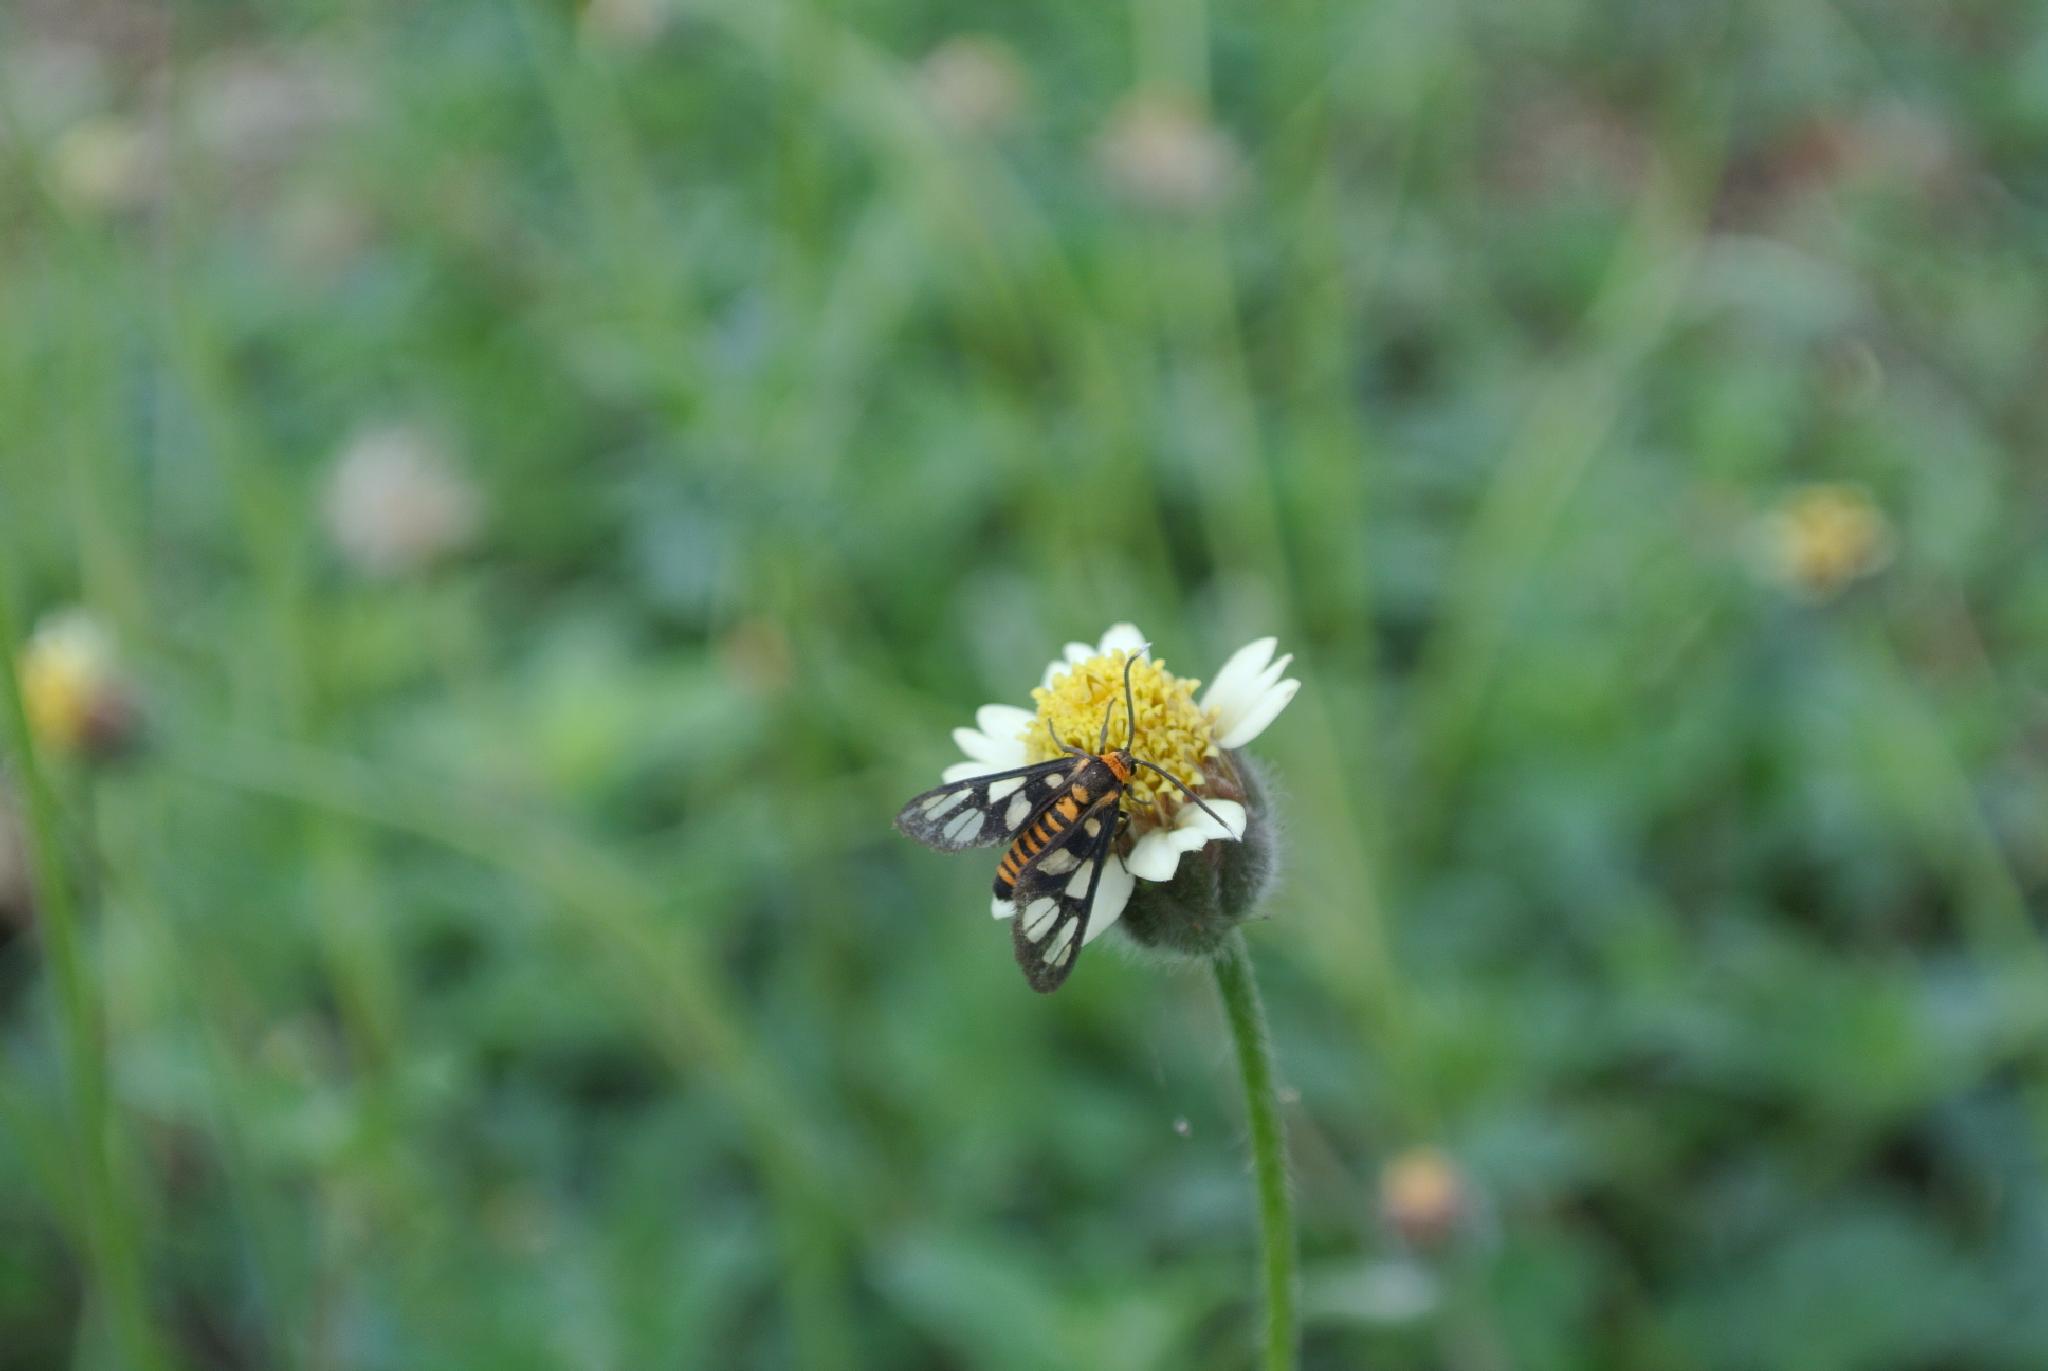 Fly on Flower by leehenrysg